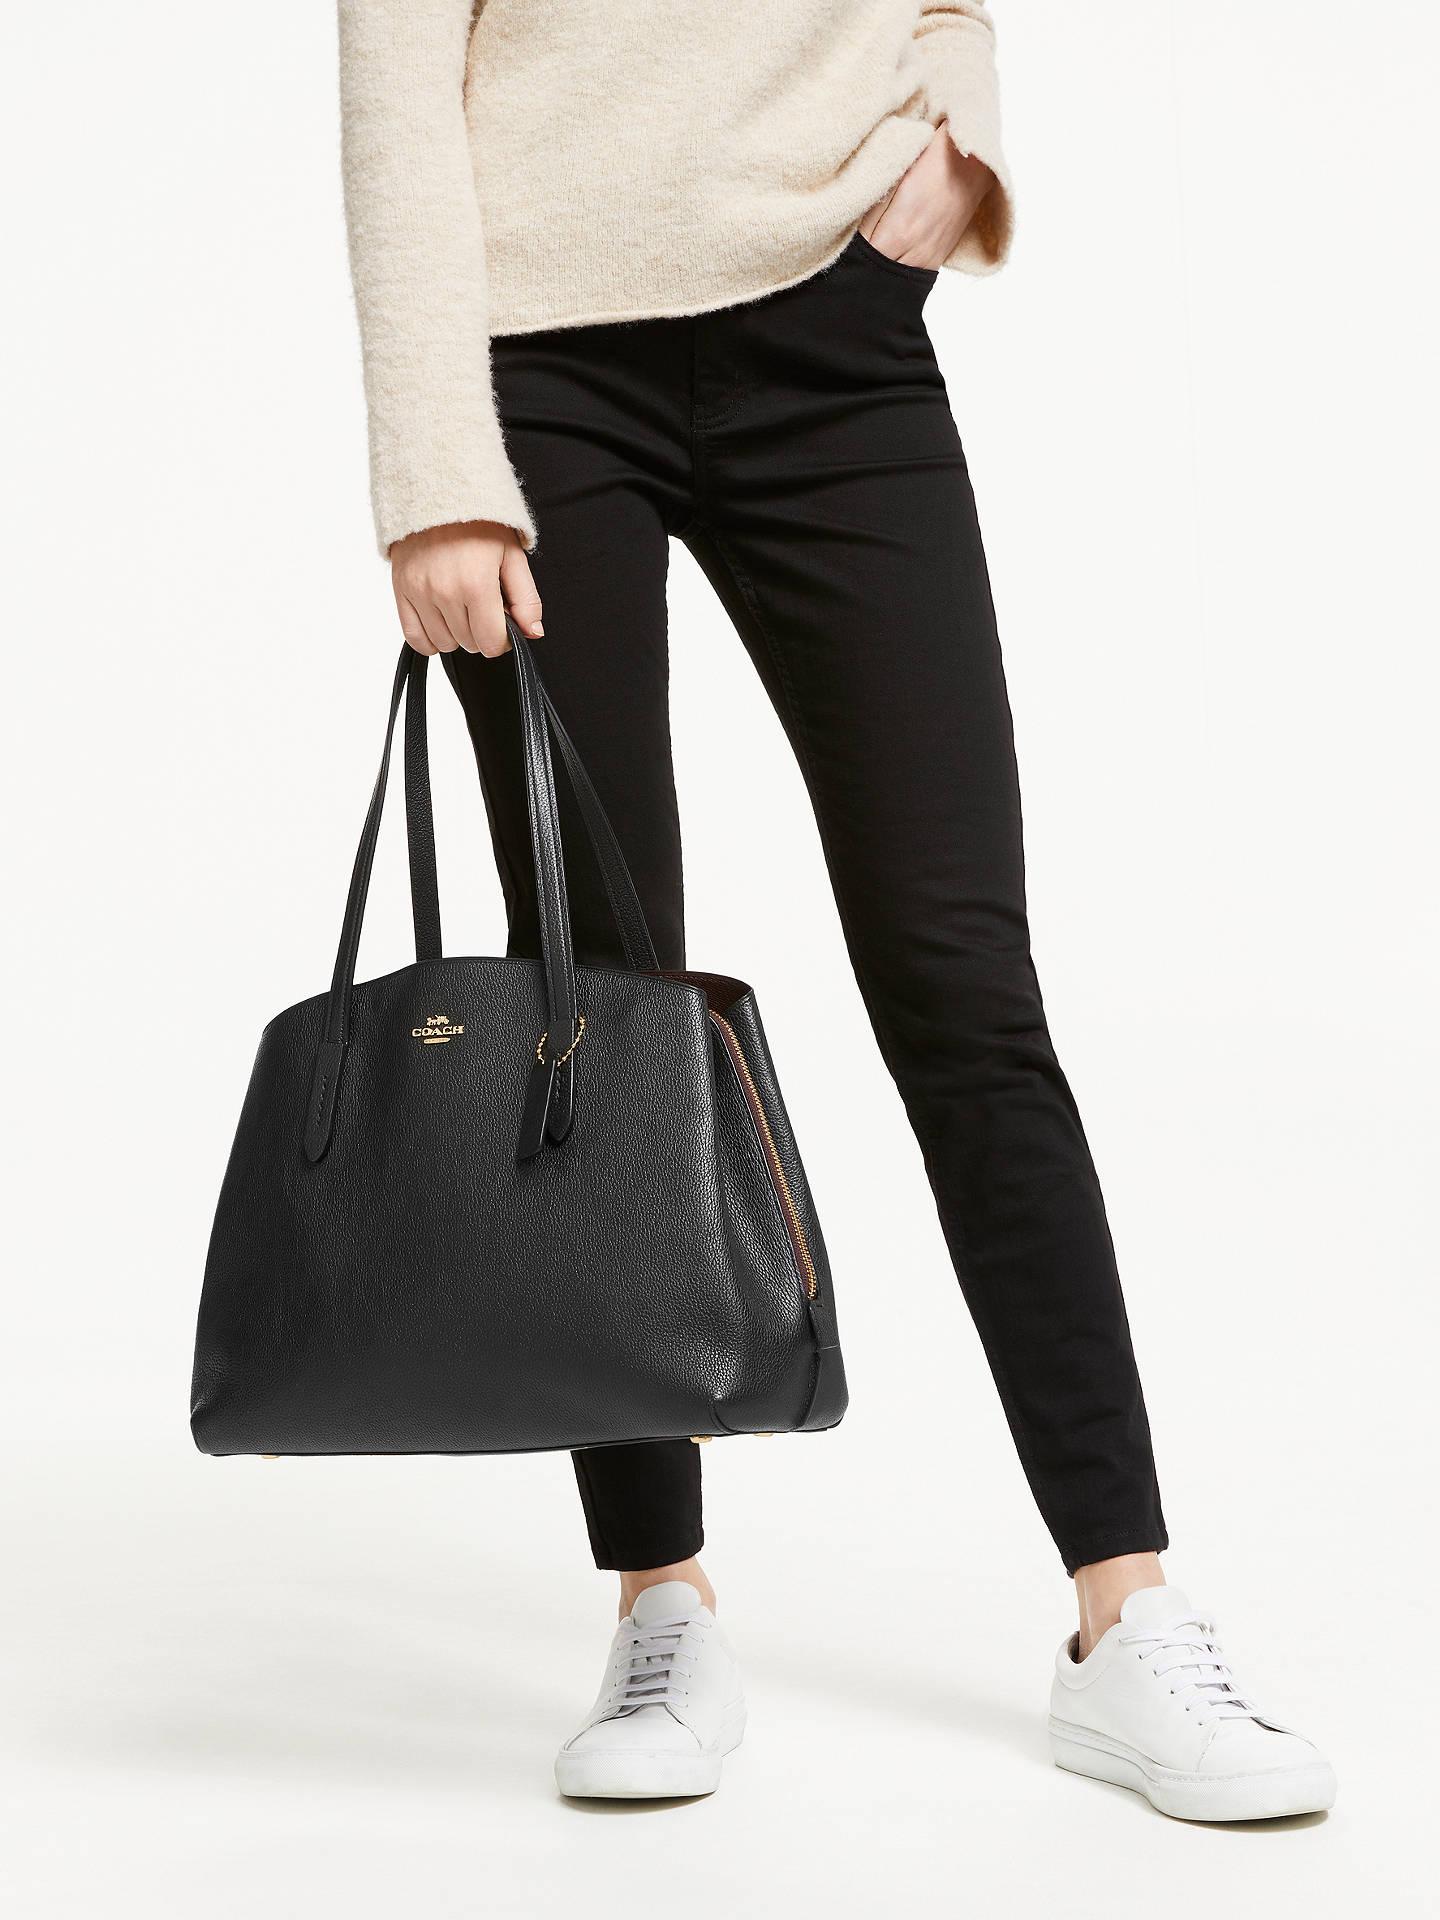 afd0e7b25f ... Buy Coach Charlie 40 Leather Carryall Tote Bag, Black Online at  johnlewis.com ...